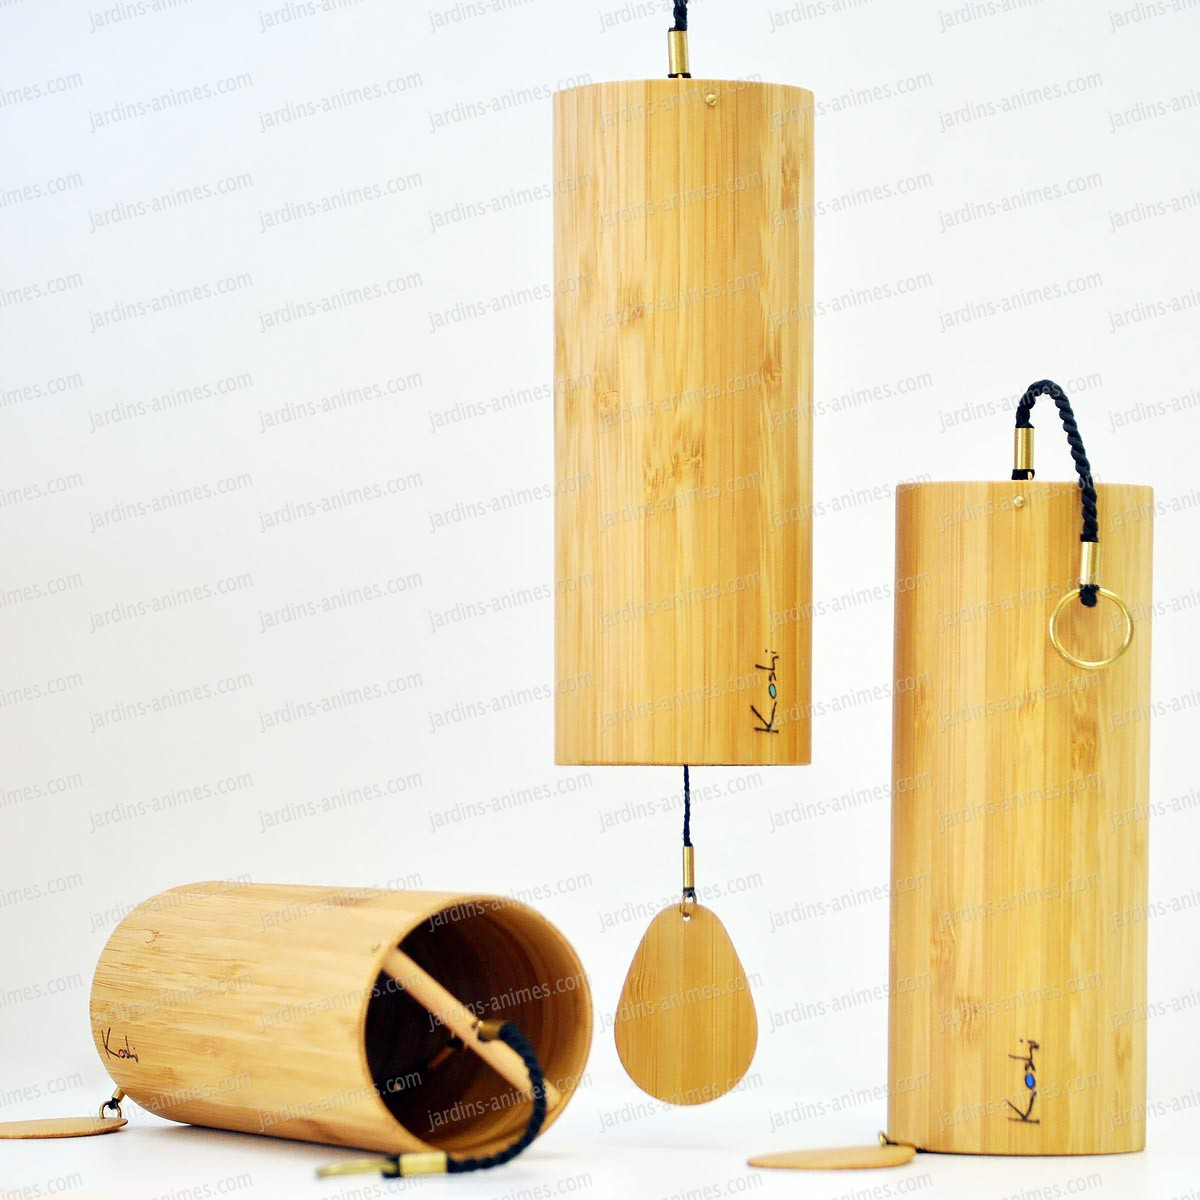 carillon koshi carillons zen et feng shui. Black Bedroom Furniture Sets. Home Design Ideas